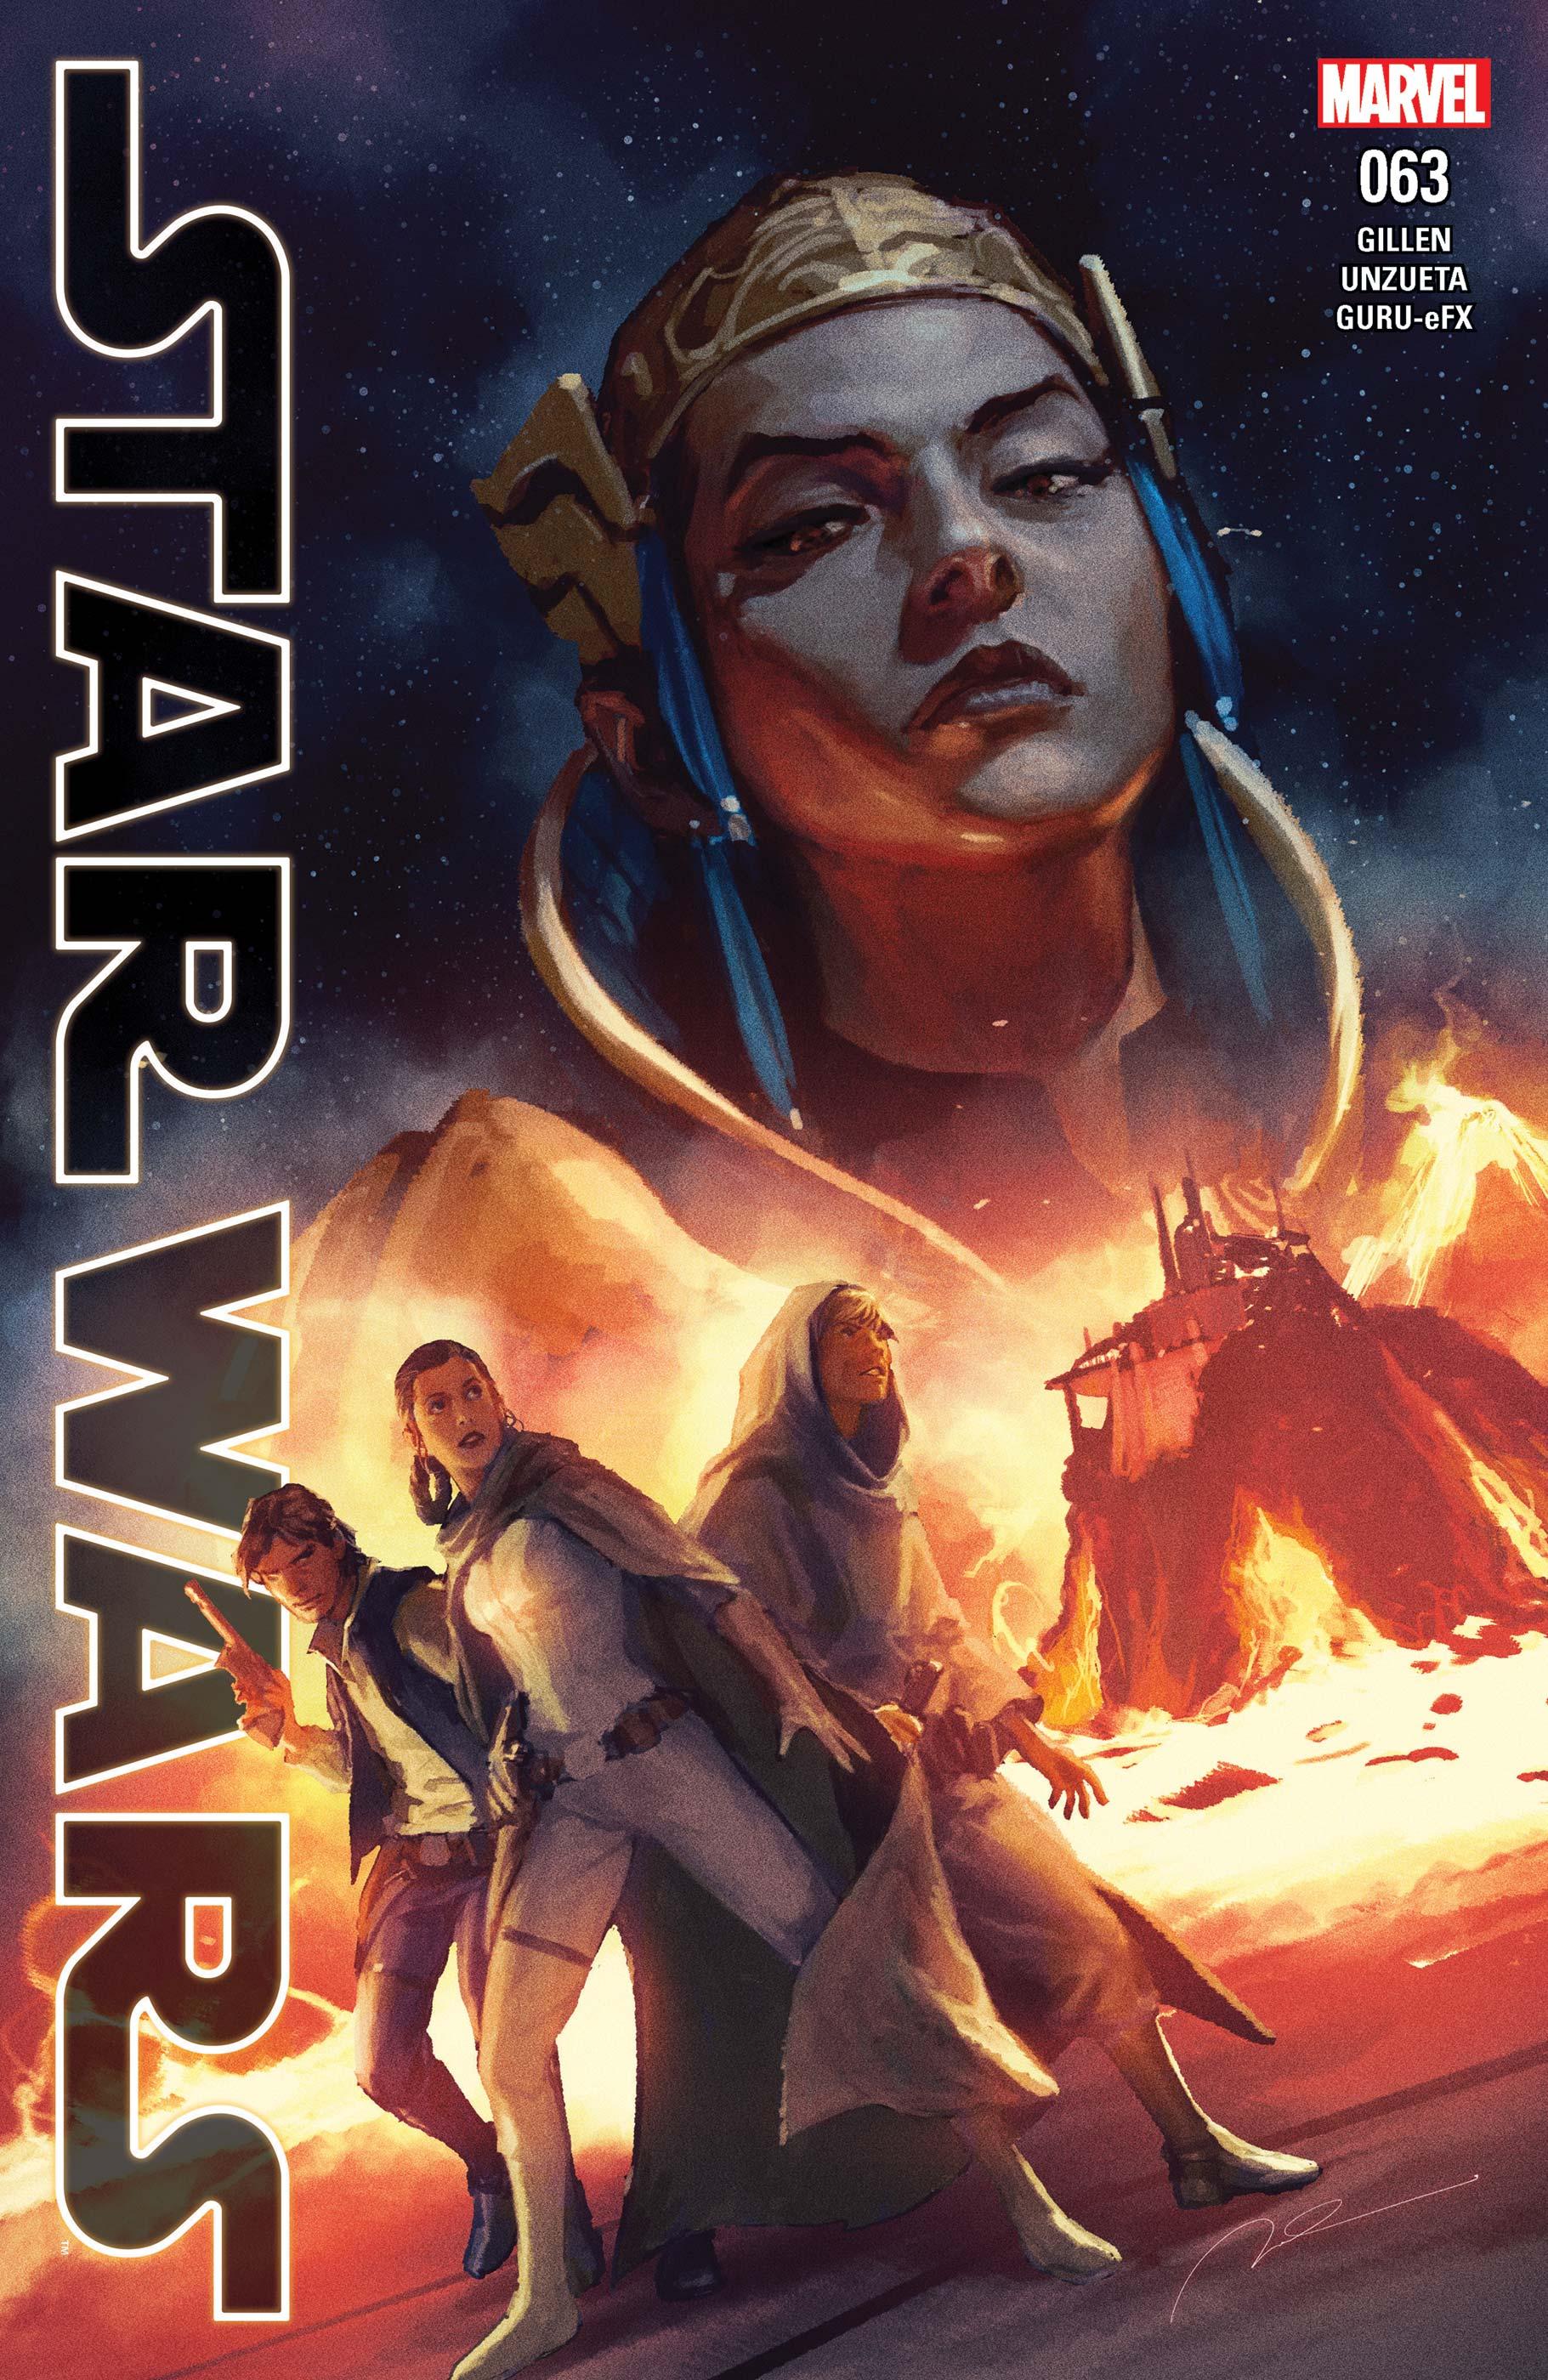 Star Wars (2015) #63